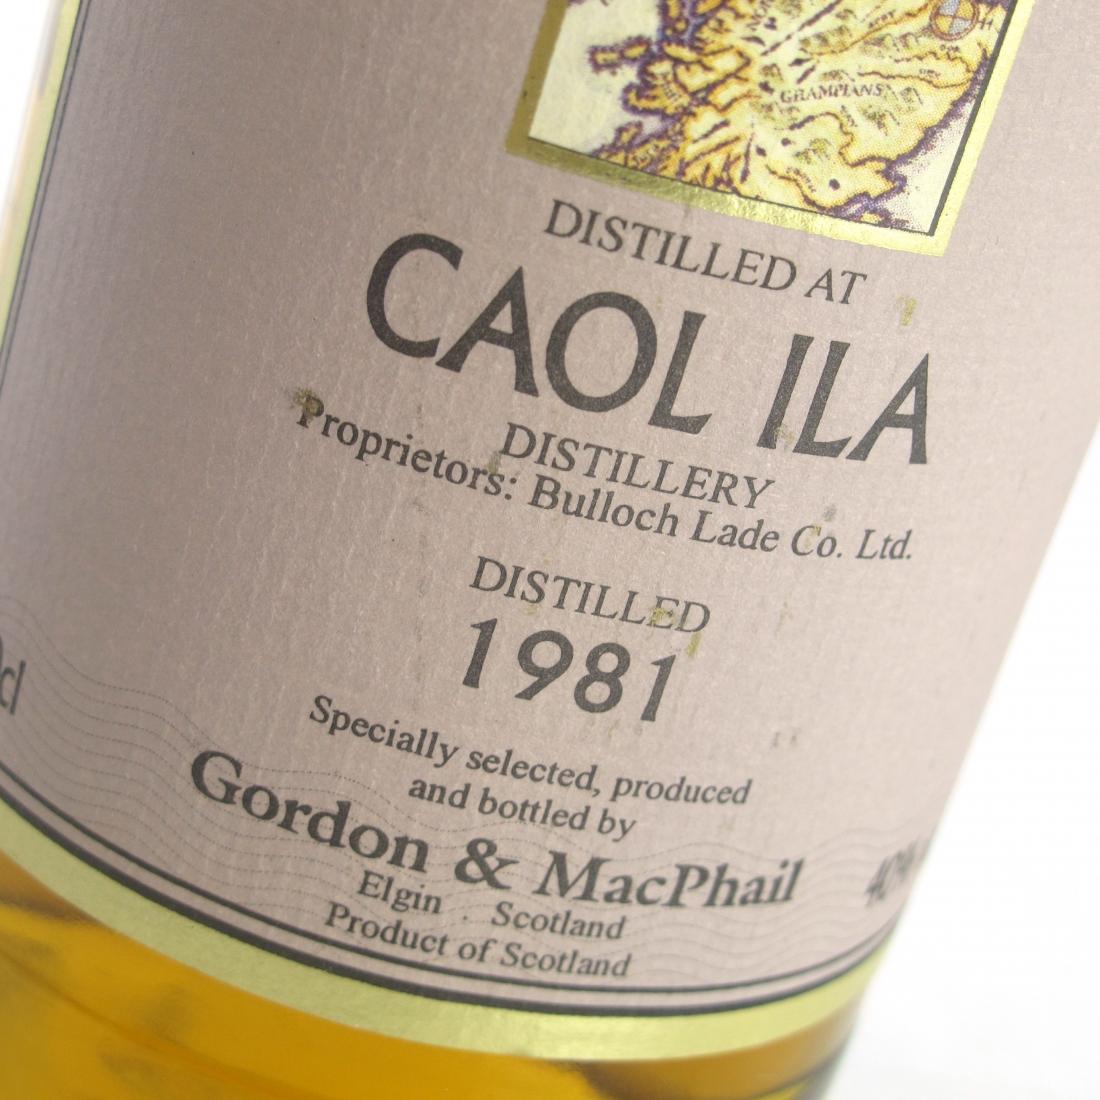 Caol Ila 1981 Gordon and MacPhail